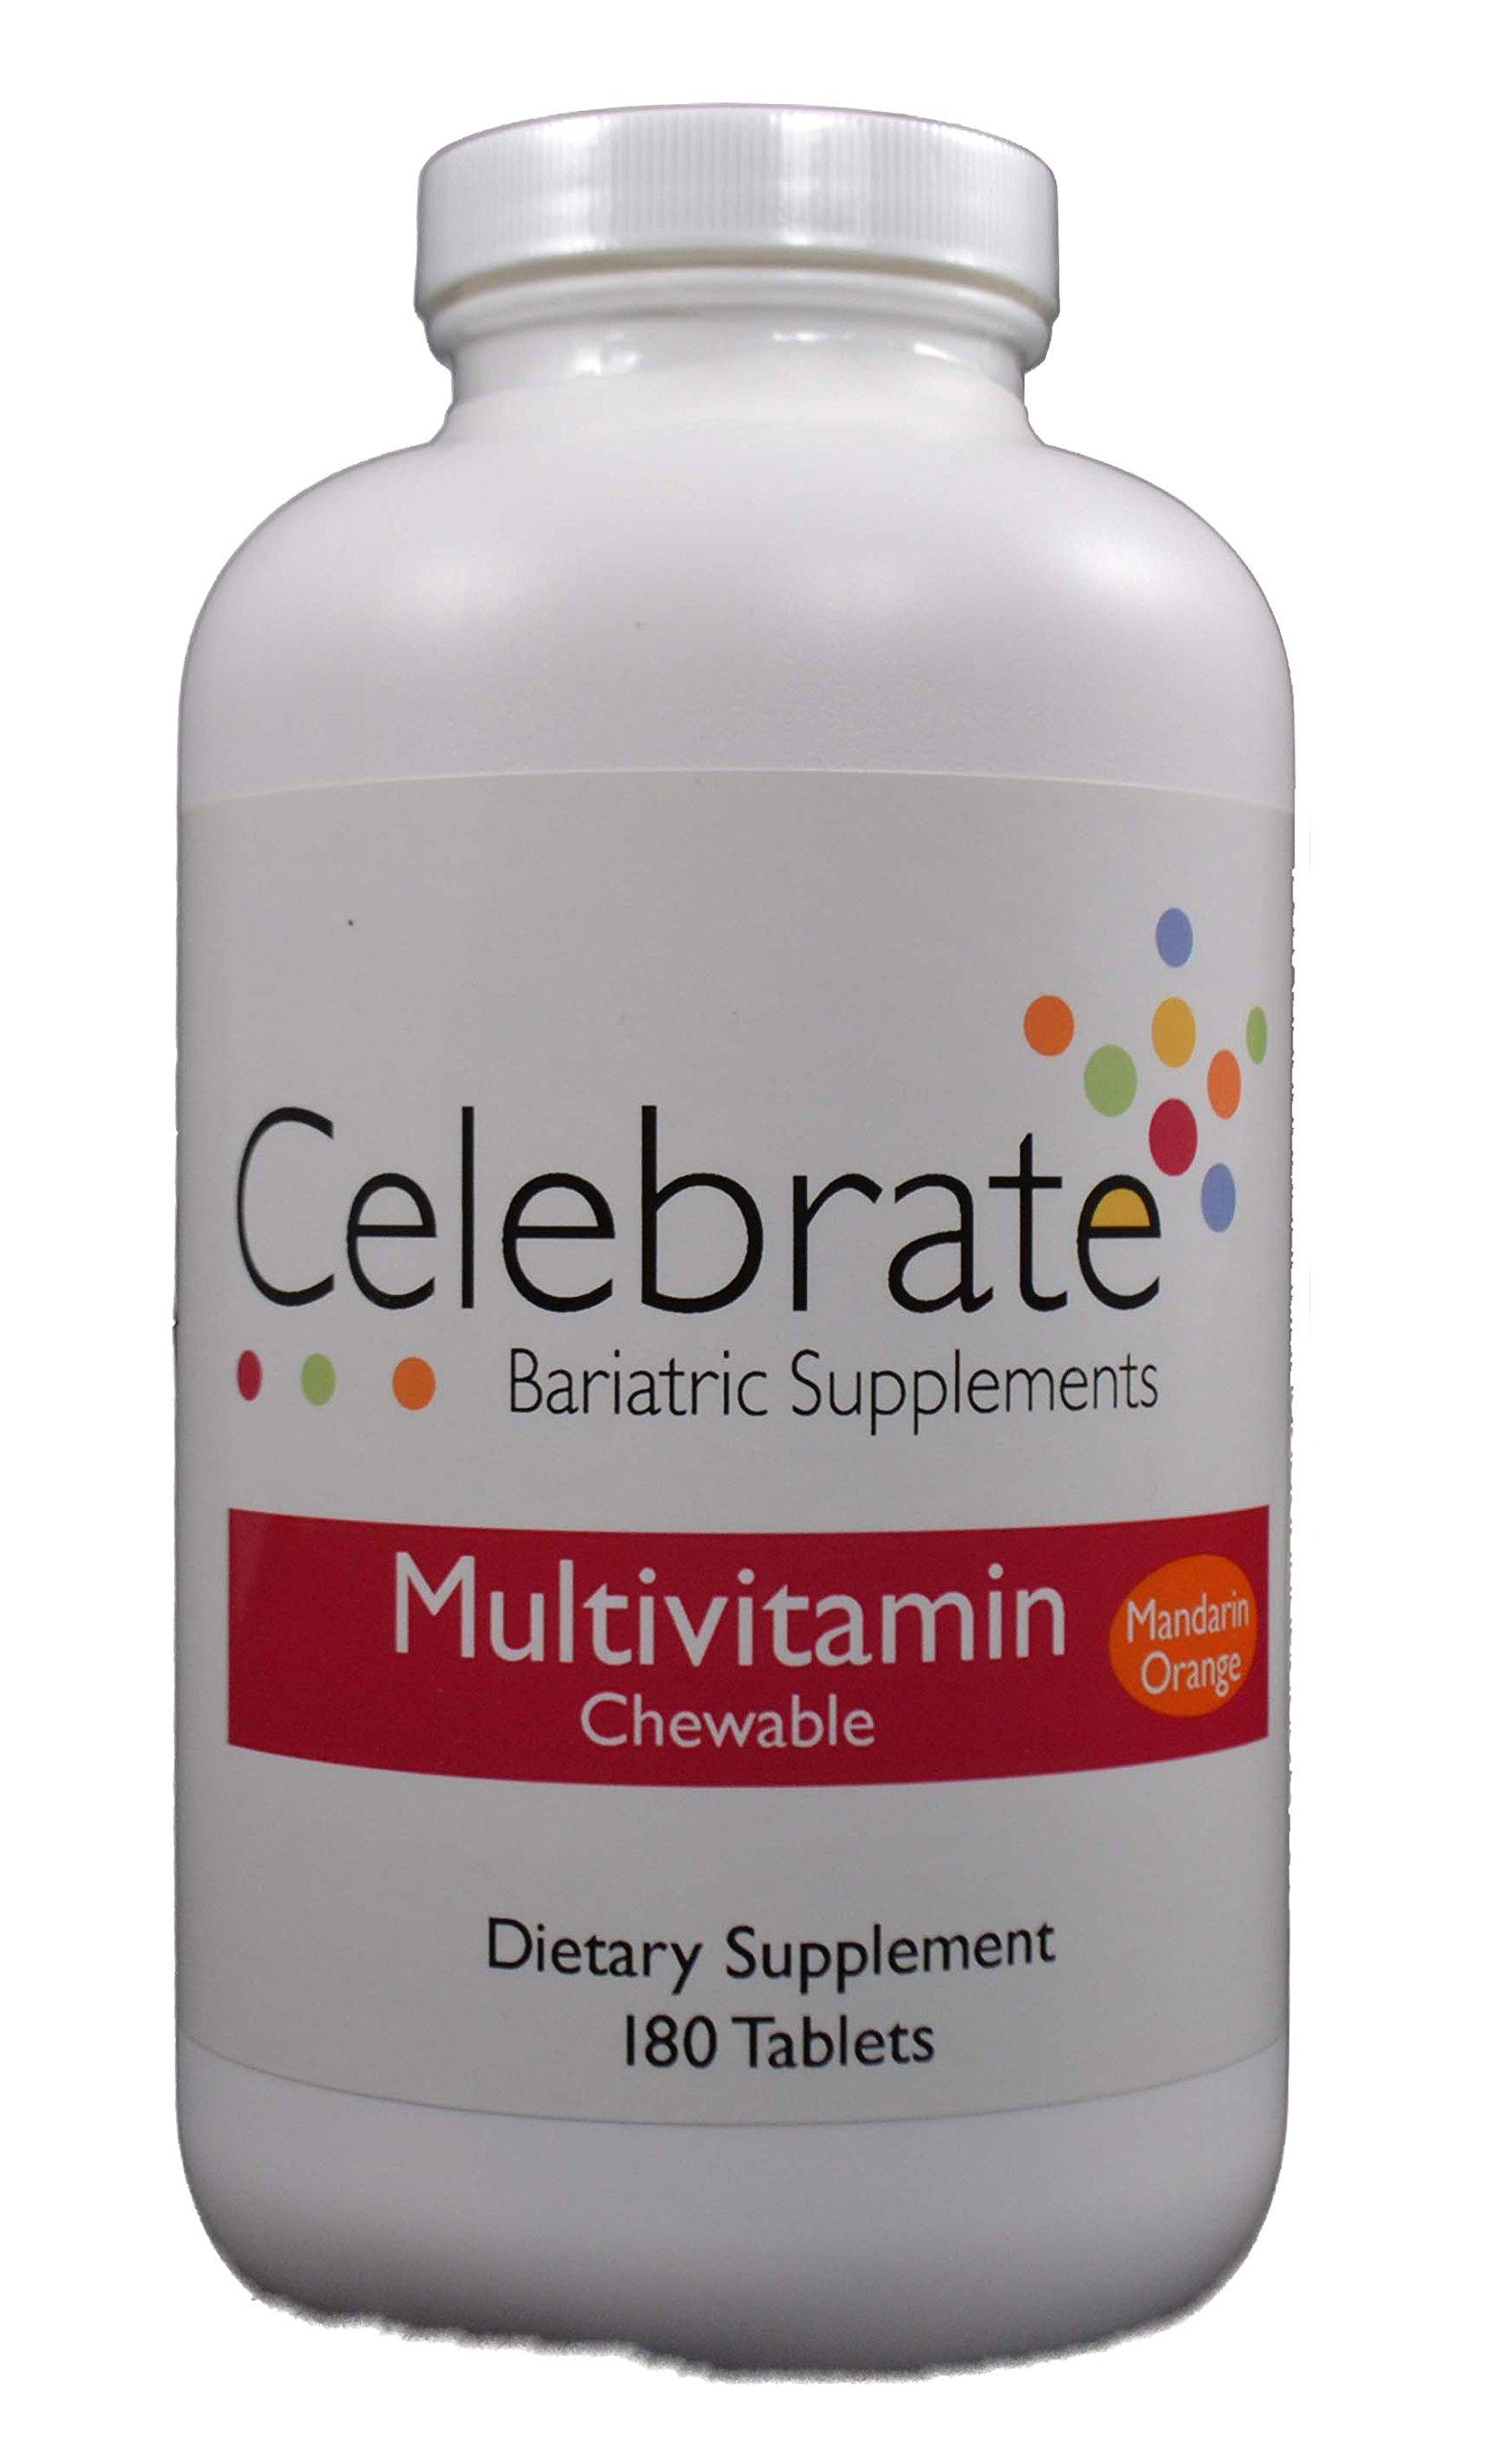 Celebrate Chewable Multivitamin, Mandarin Orange, 180 Per Bottle